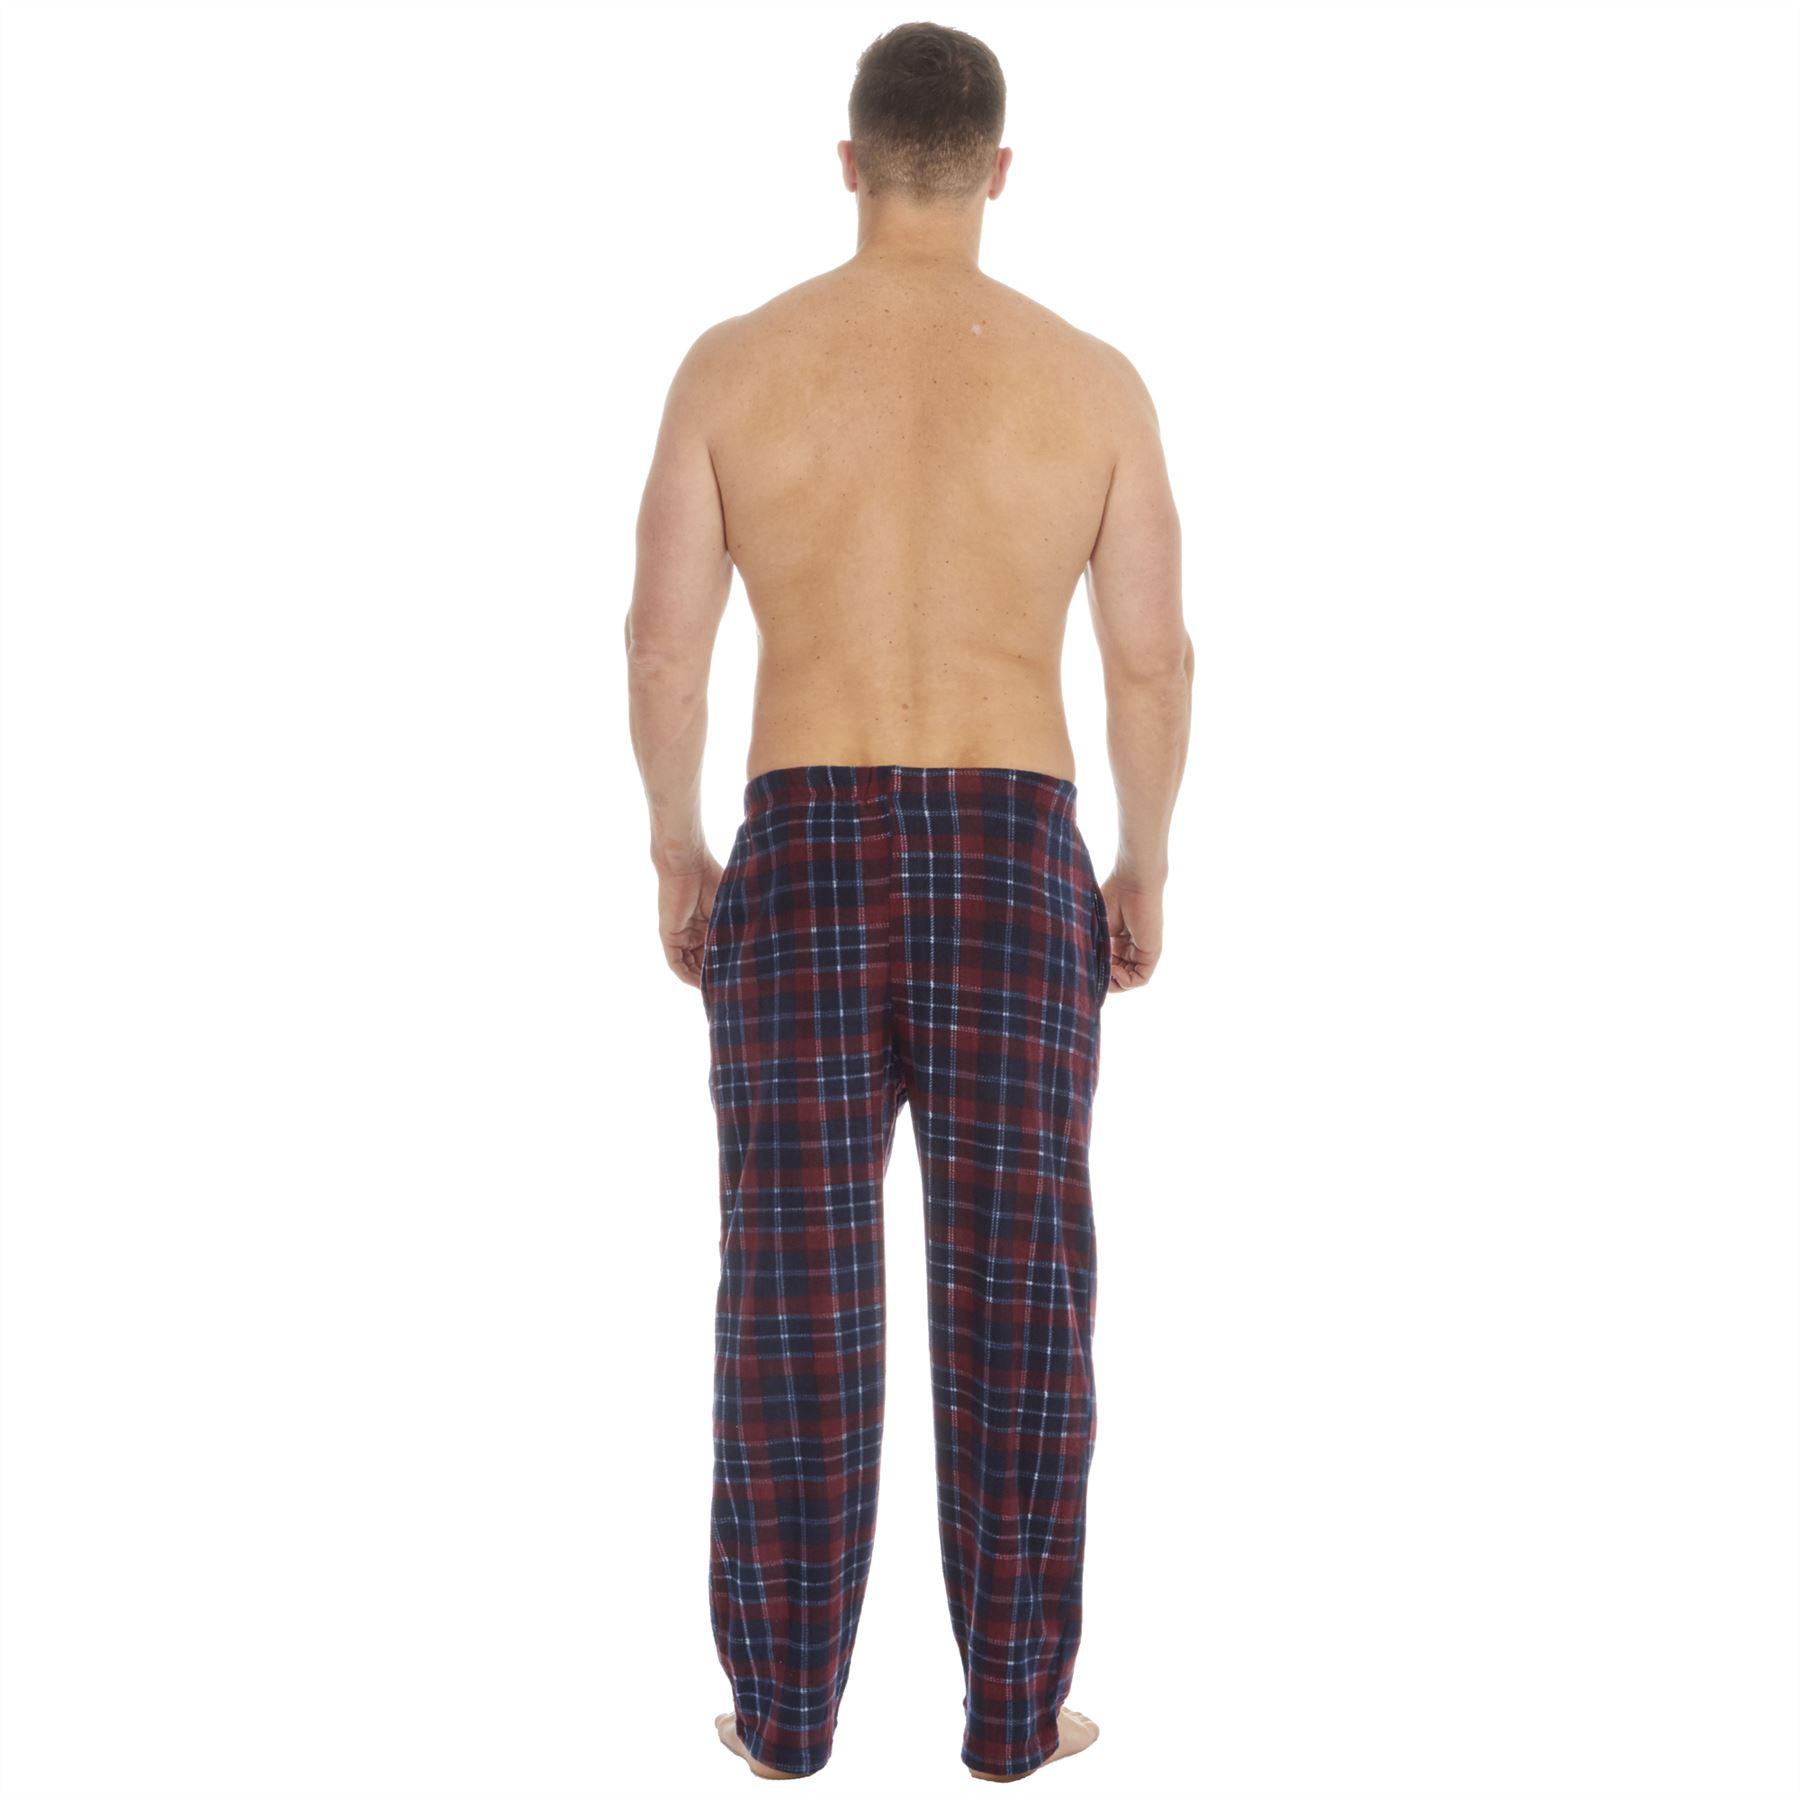 Hombre Suave Microfleece Cuadros Salon Pantalones Pantalon De Pijama Ebay